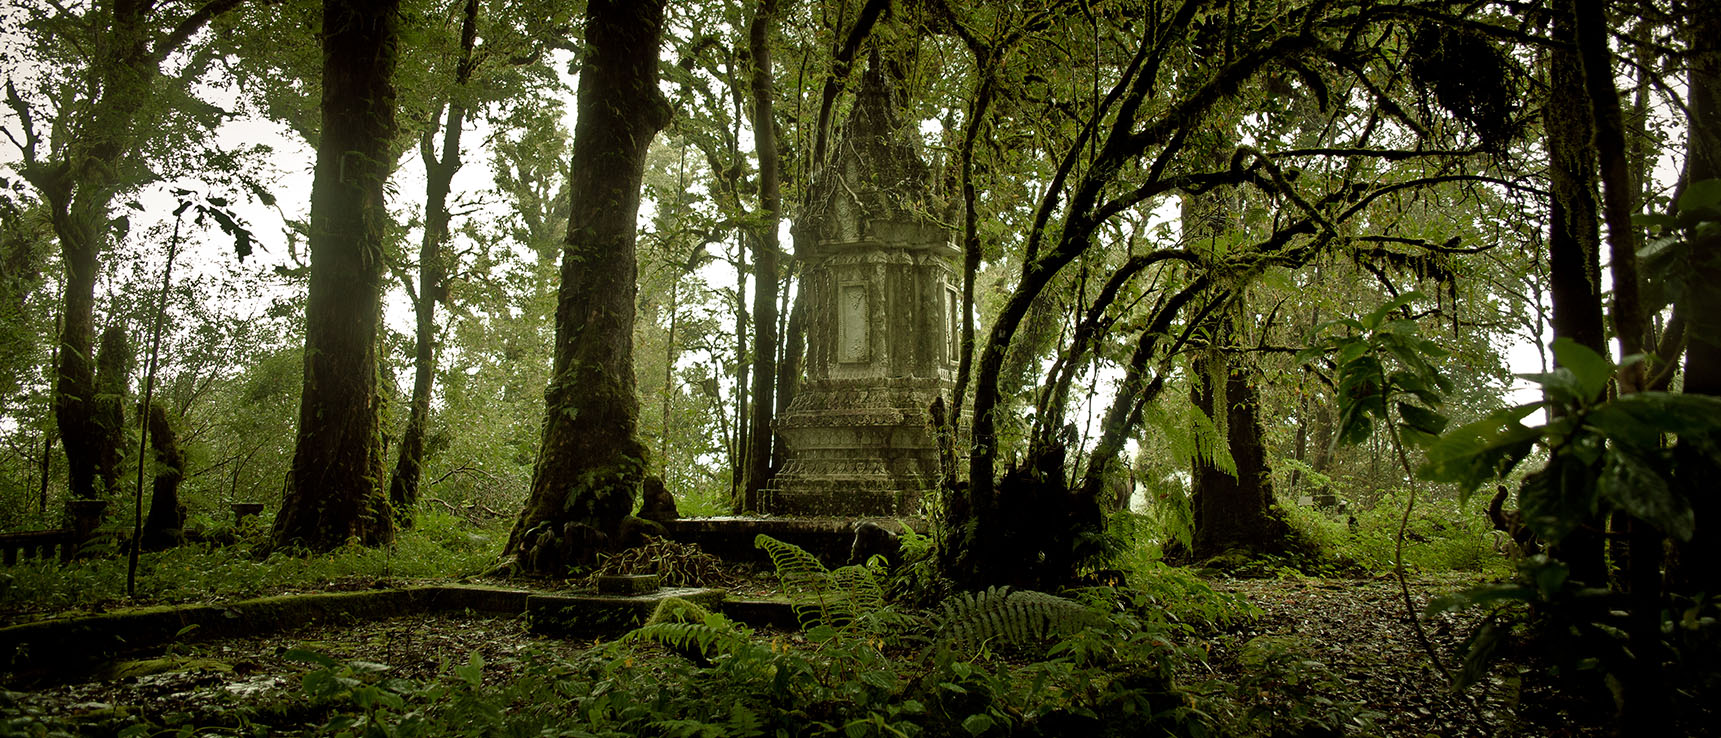 Doi inthanon jungle temple thailand